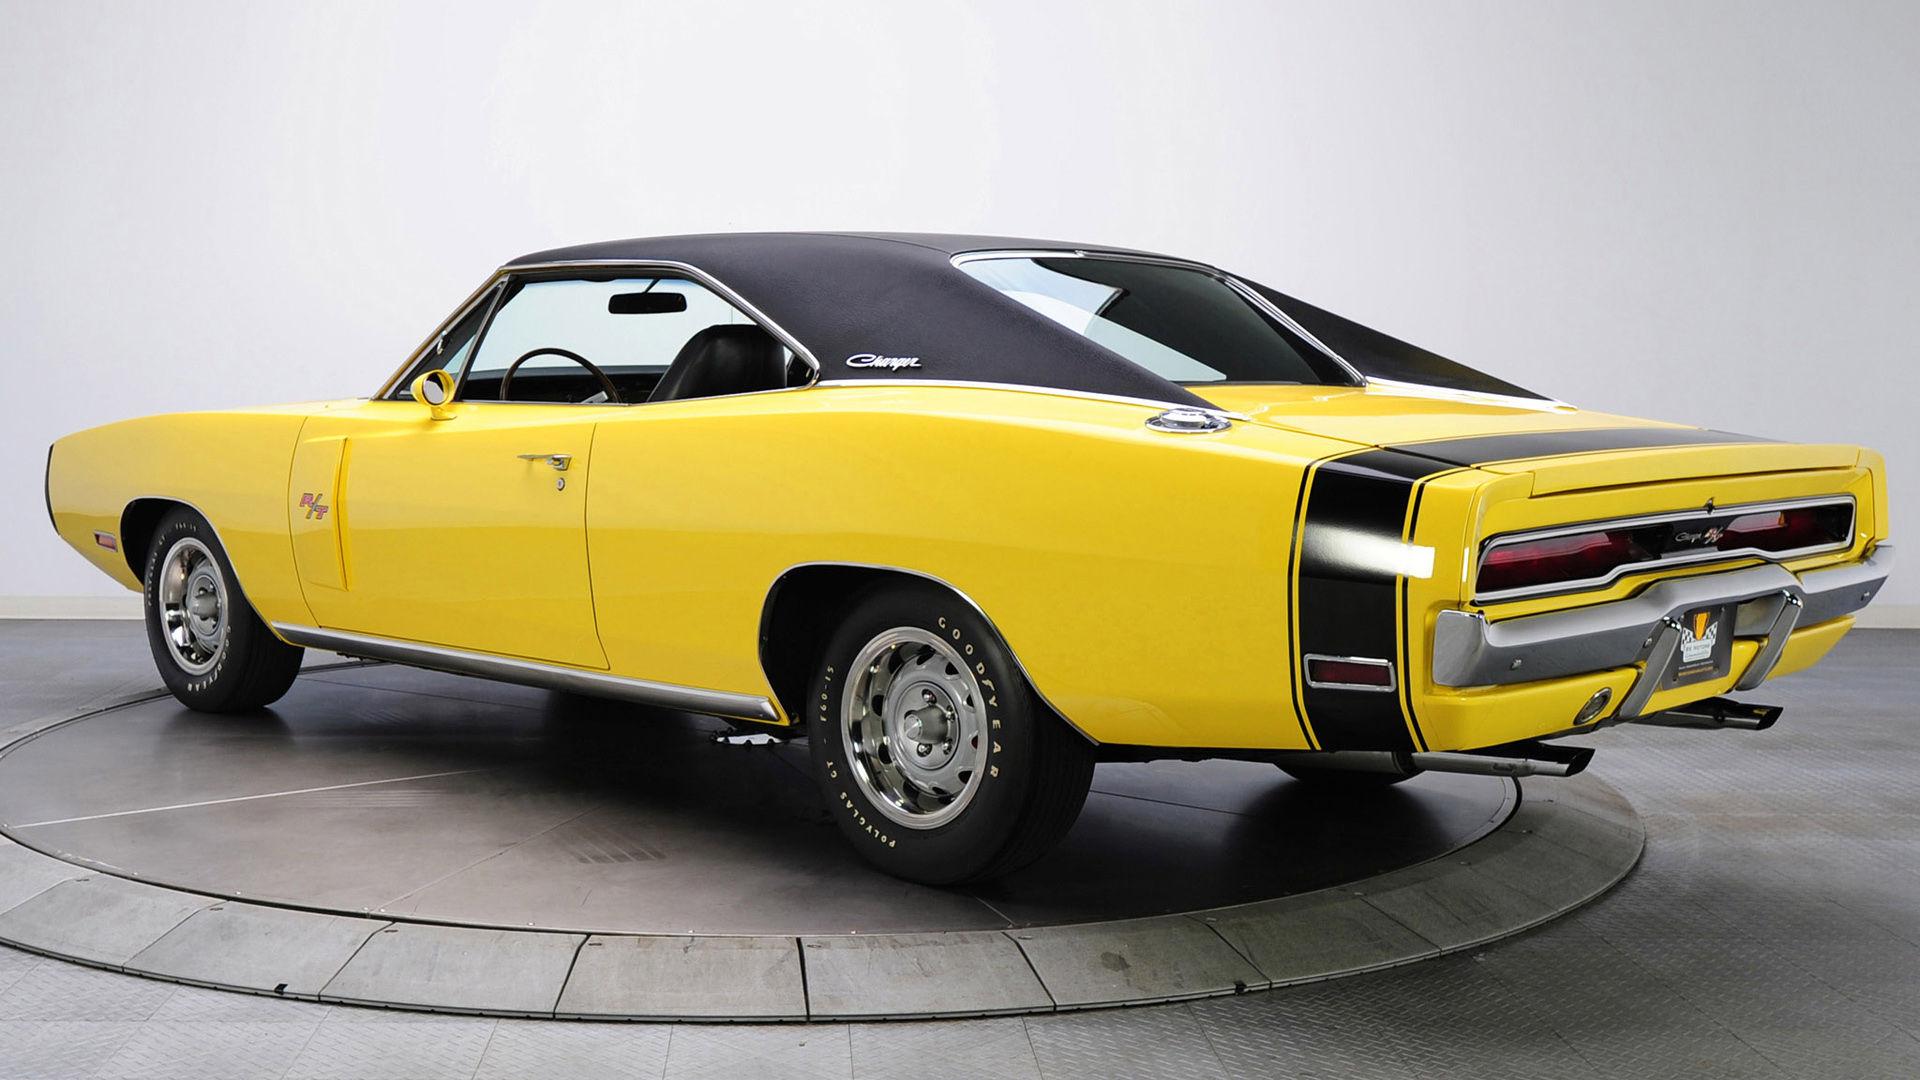 1970 Dodge Charger RT 426 Hemi